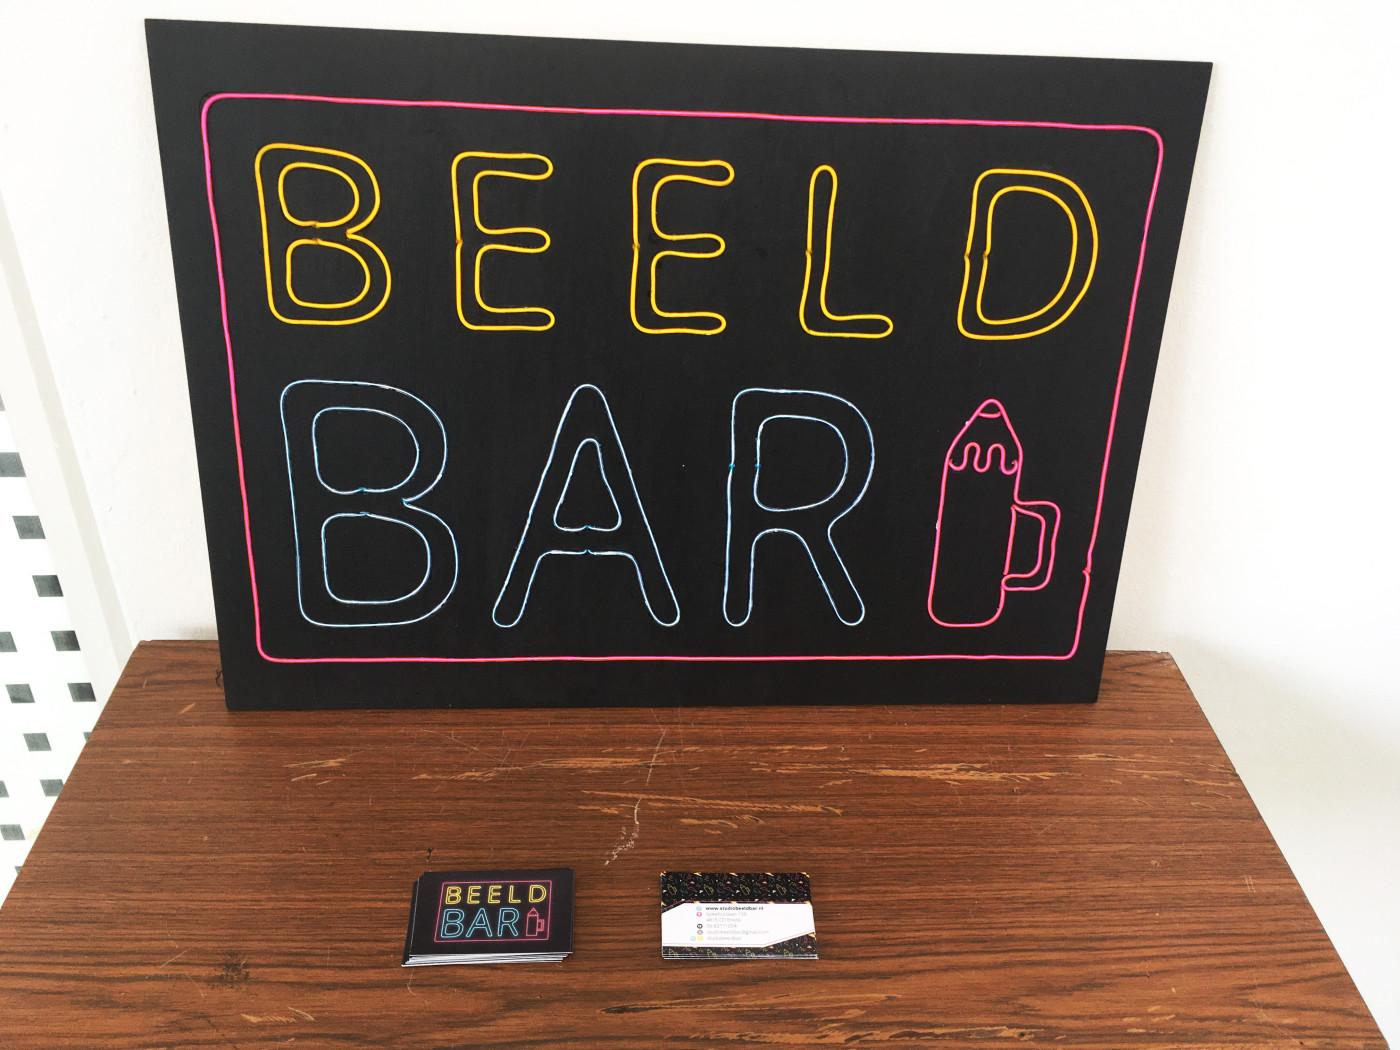 Beeldbar neon